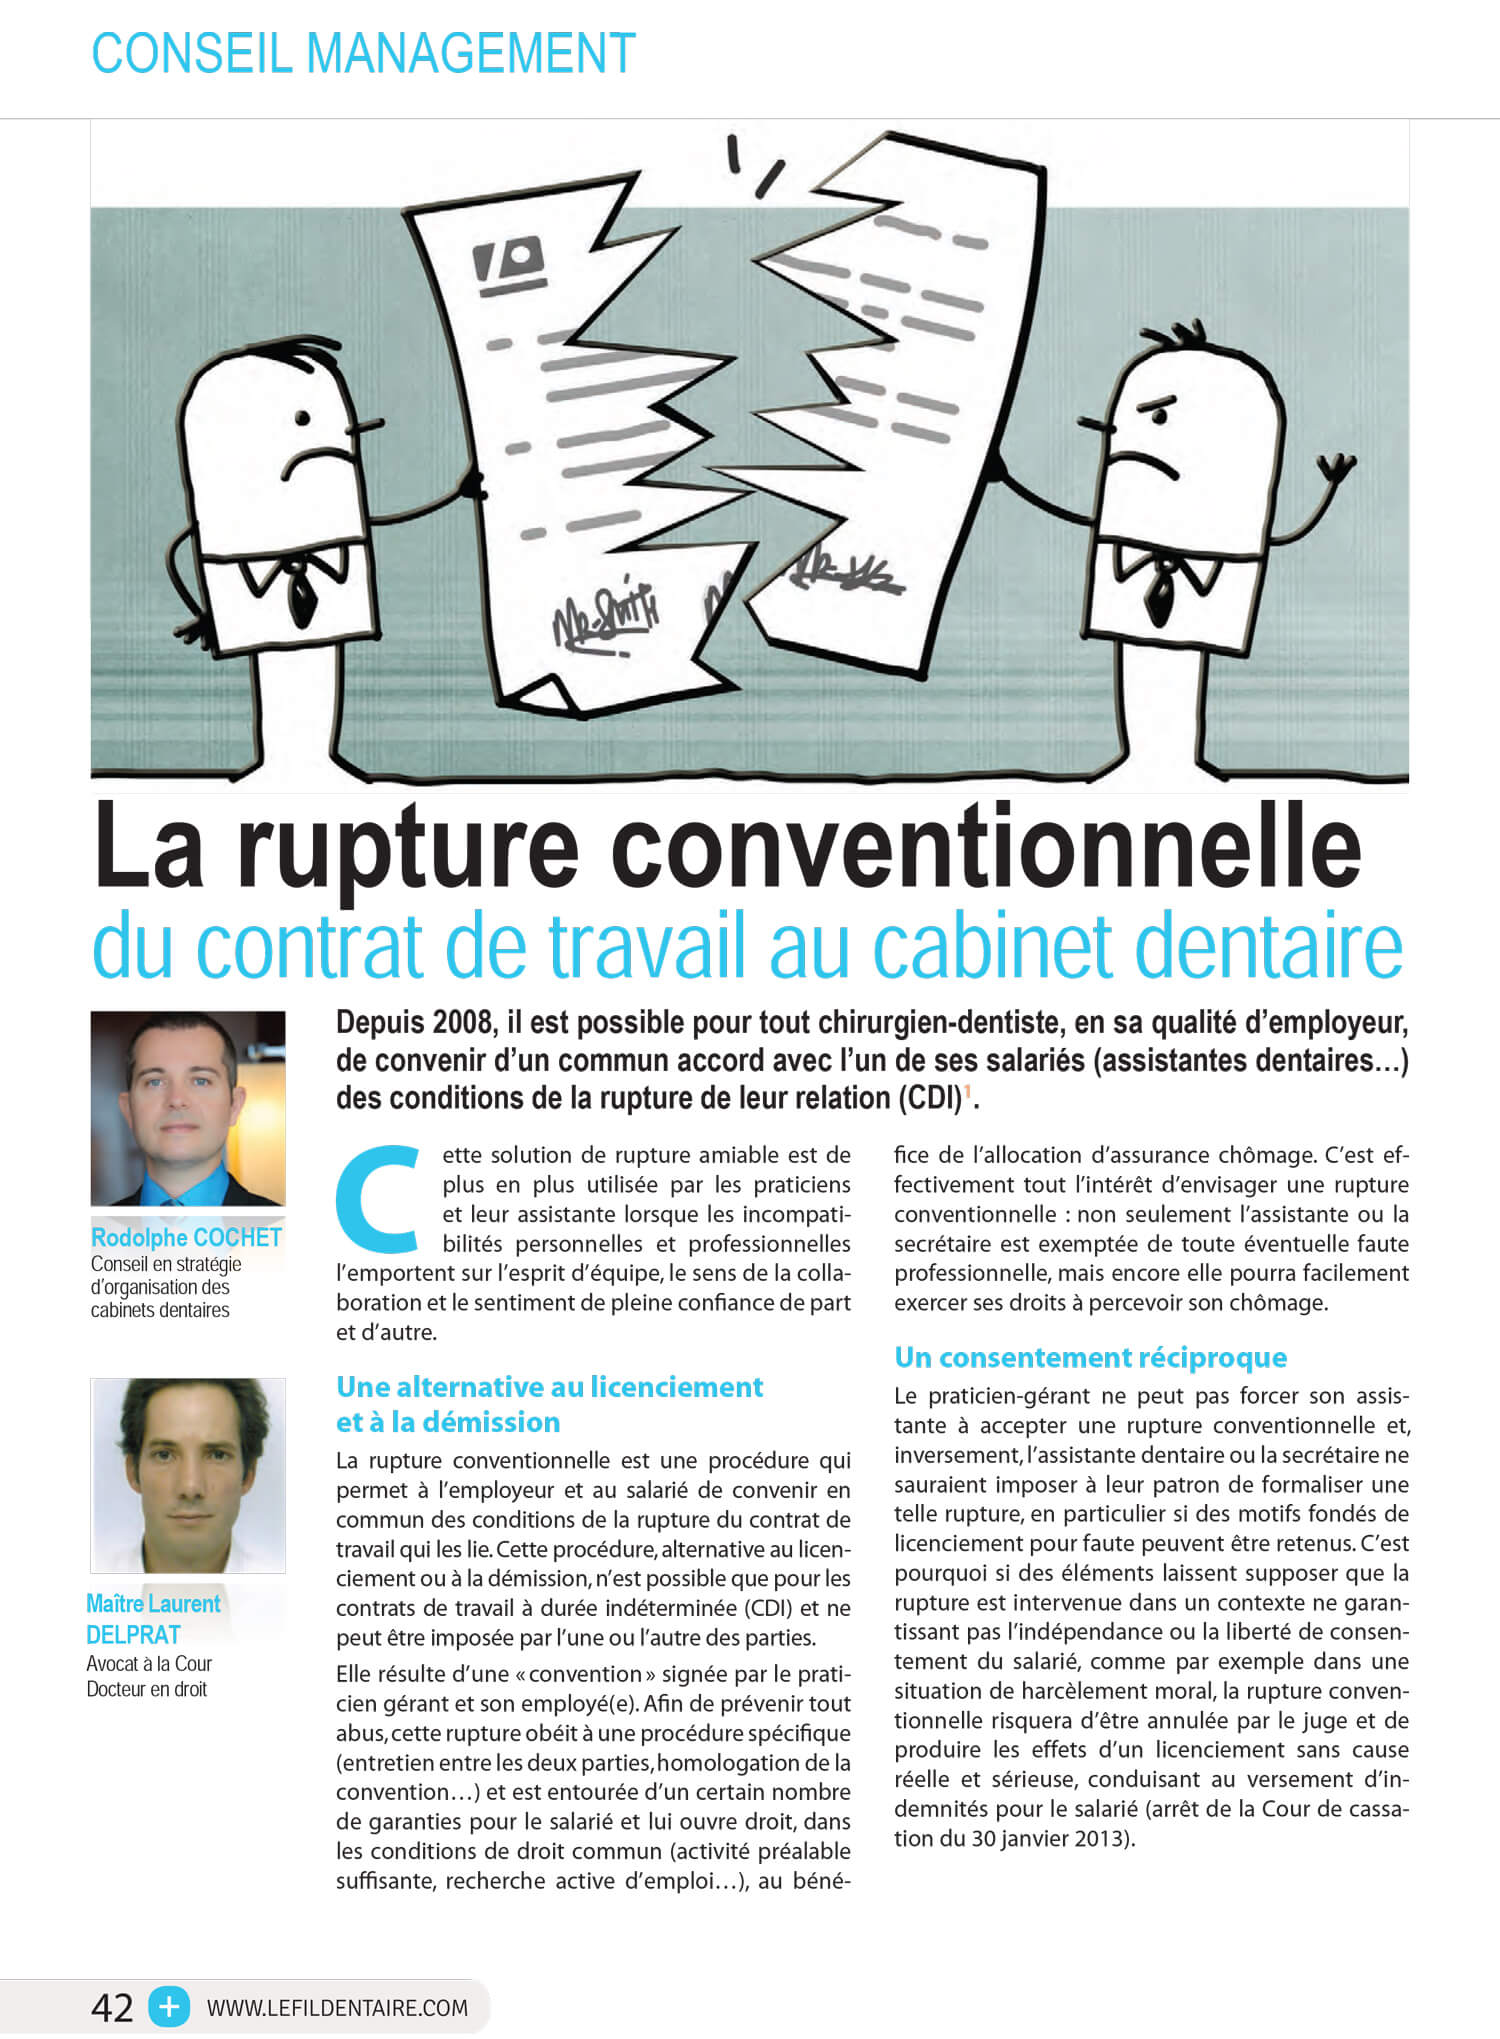 rupture-conventionnelle-contrat-cabinet-dentaire-rodolphe-cochet.jpg